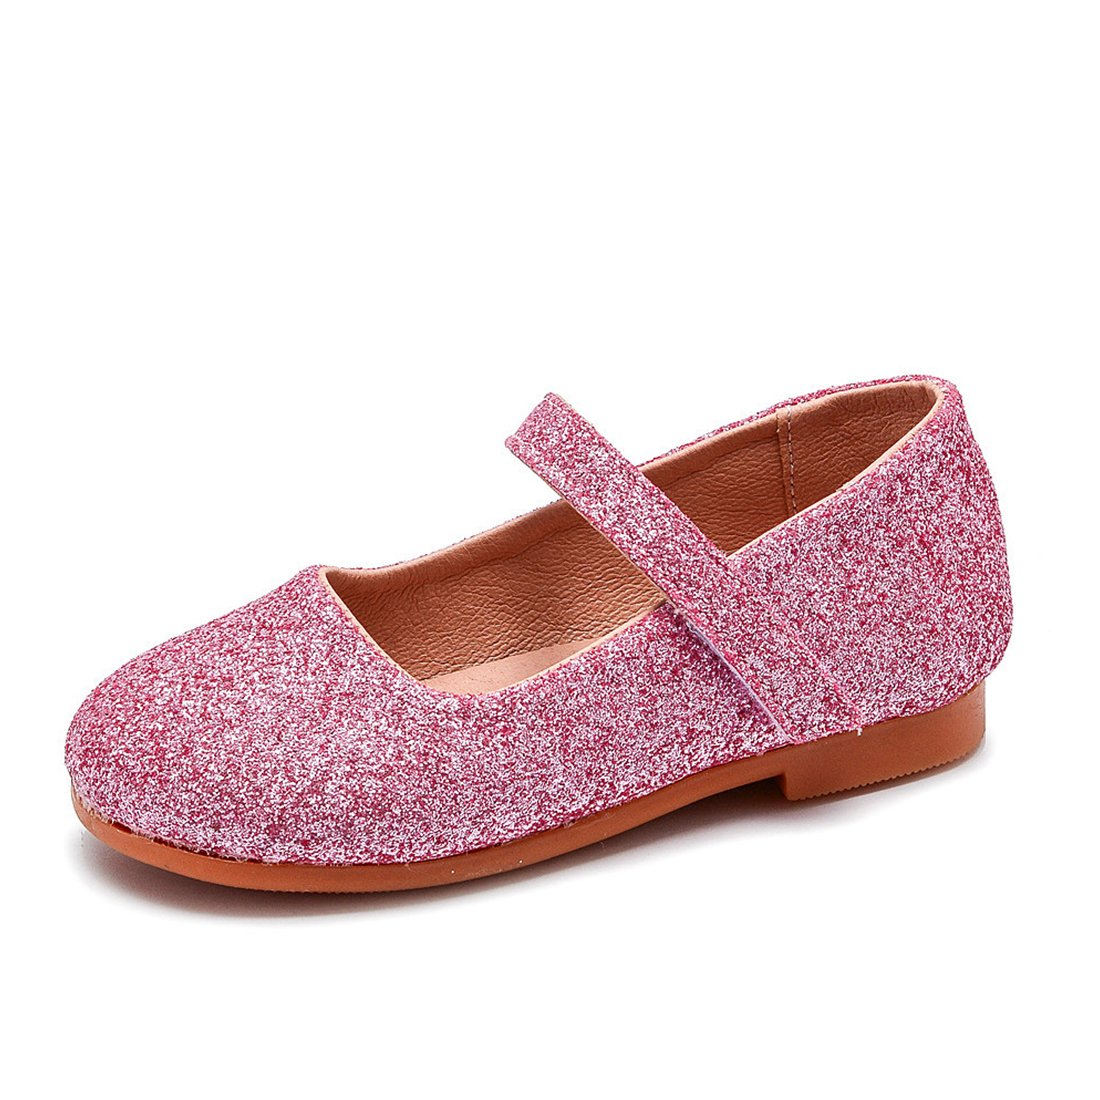 Littlle Kids Girls Glitter PU Leather Wedding Dancing Party Dress Flat Shoes Pink Size 11